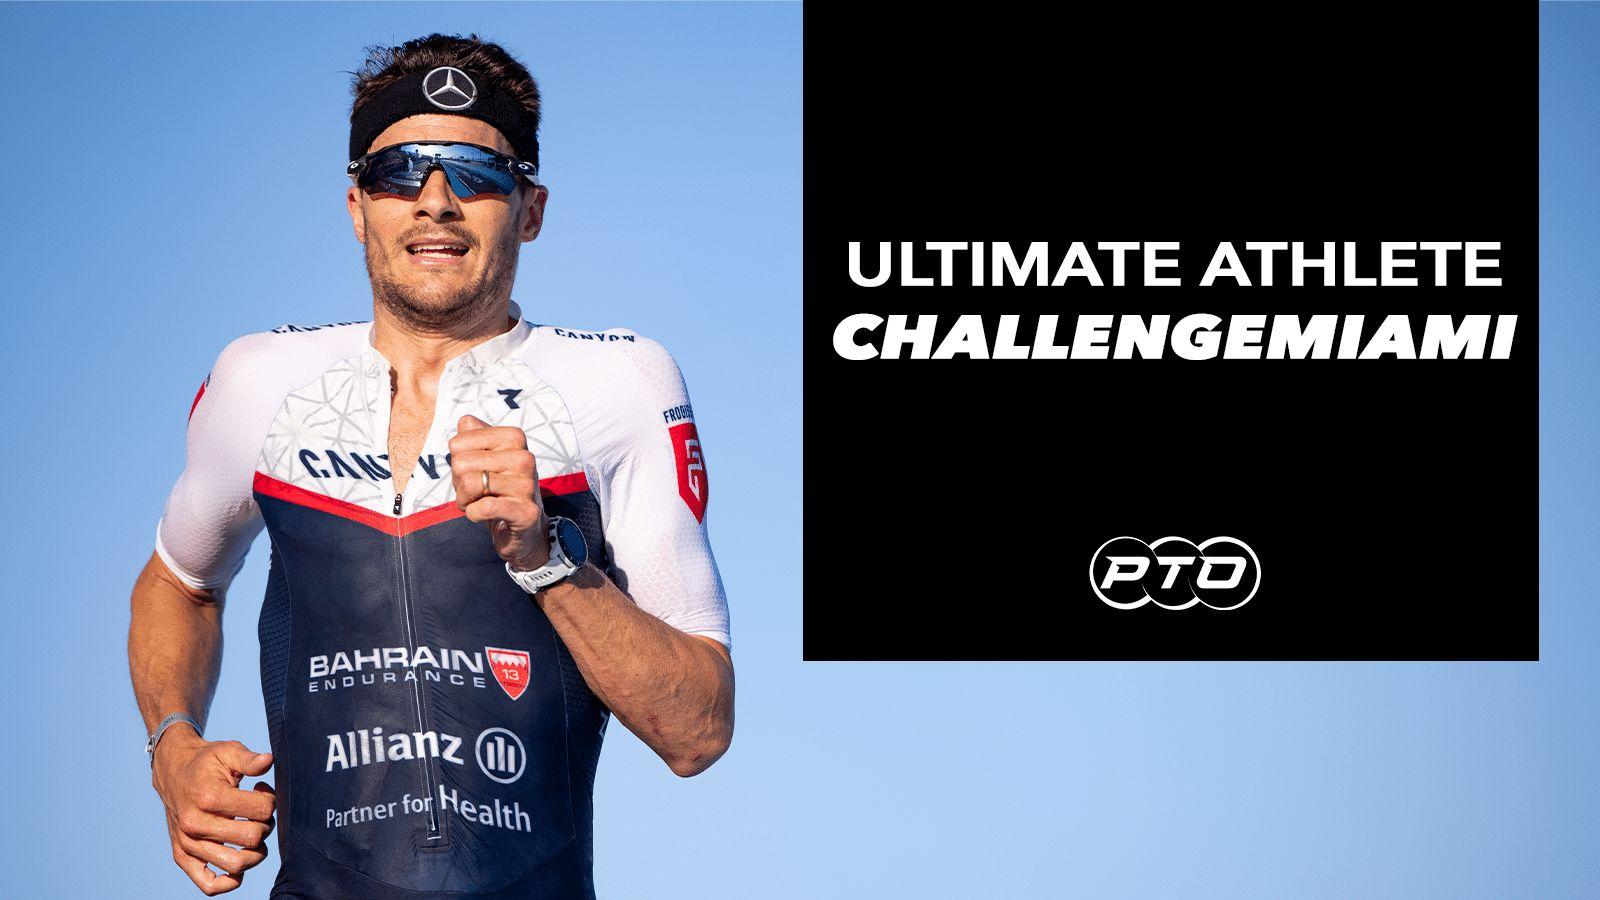 Ultimate Athlete: CHALLENGEMIAMI